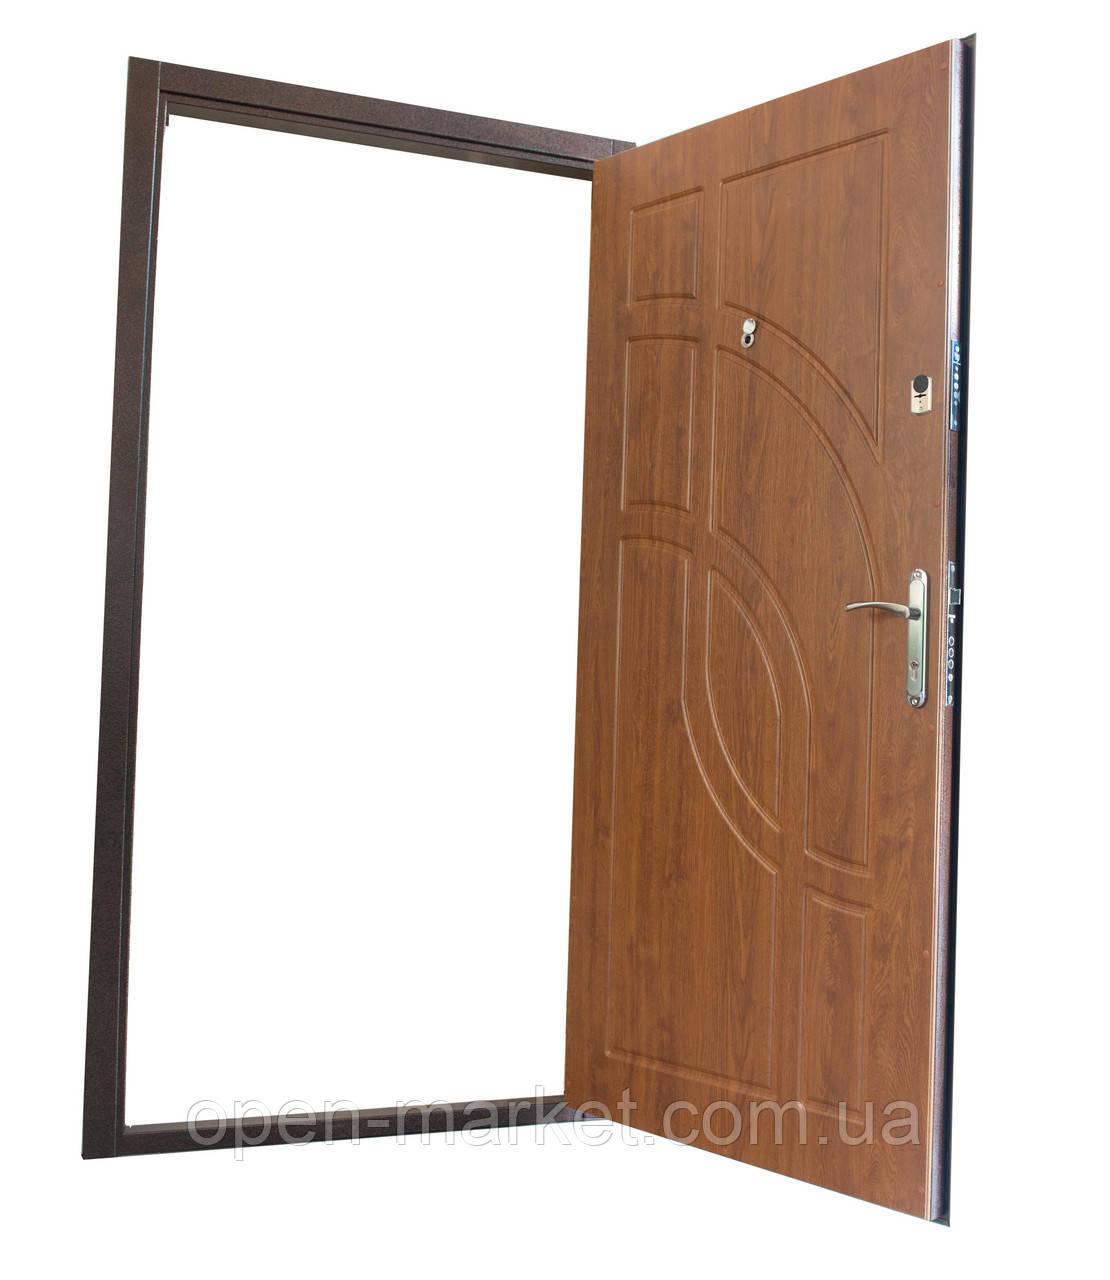 Двері вуличні Посад-Покровське Херсонська область